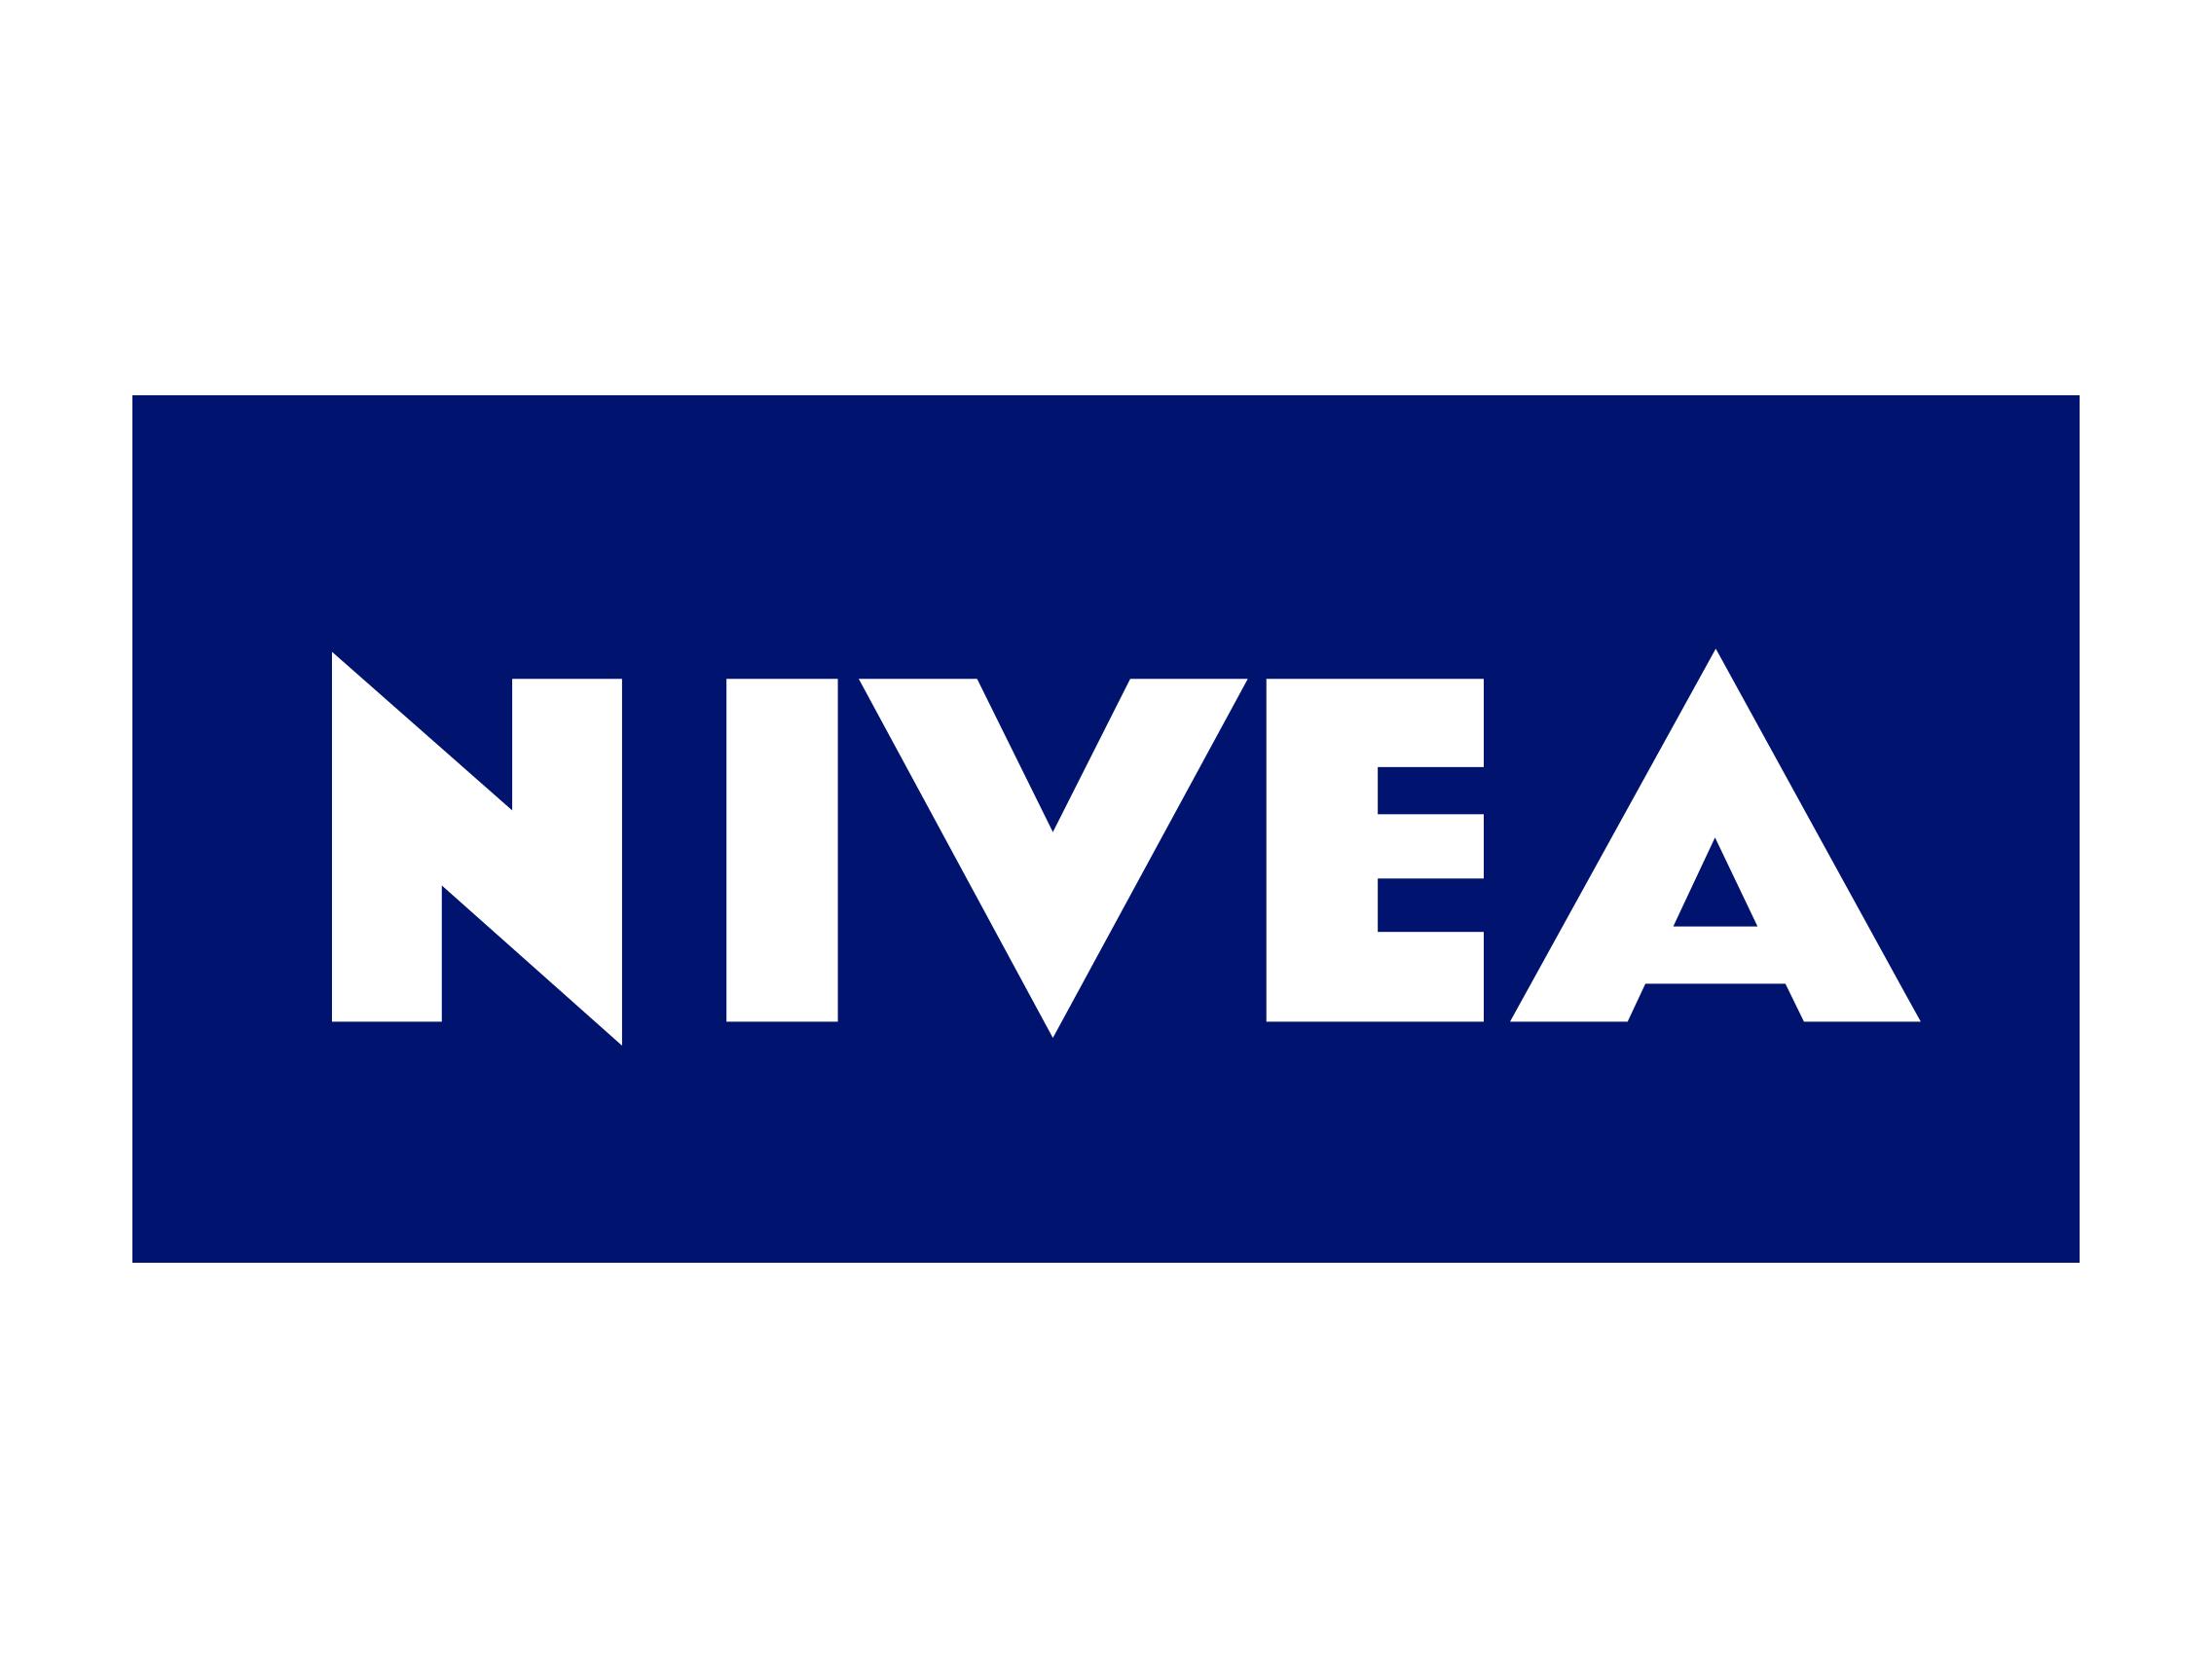 Nivea-logo-old